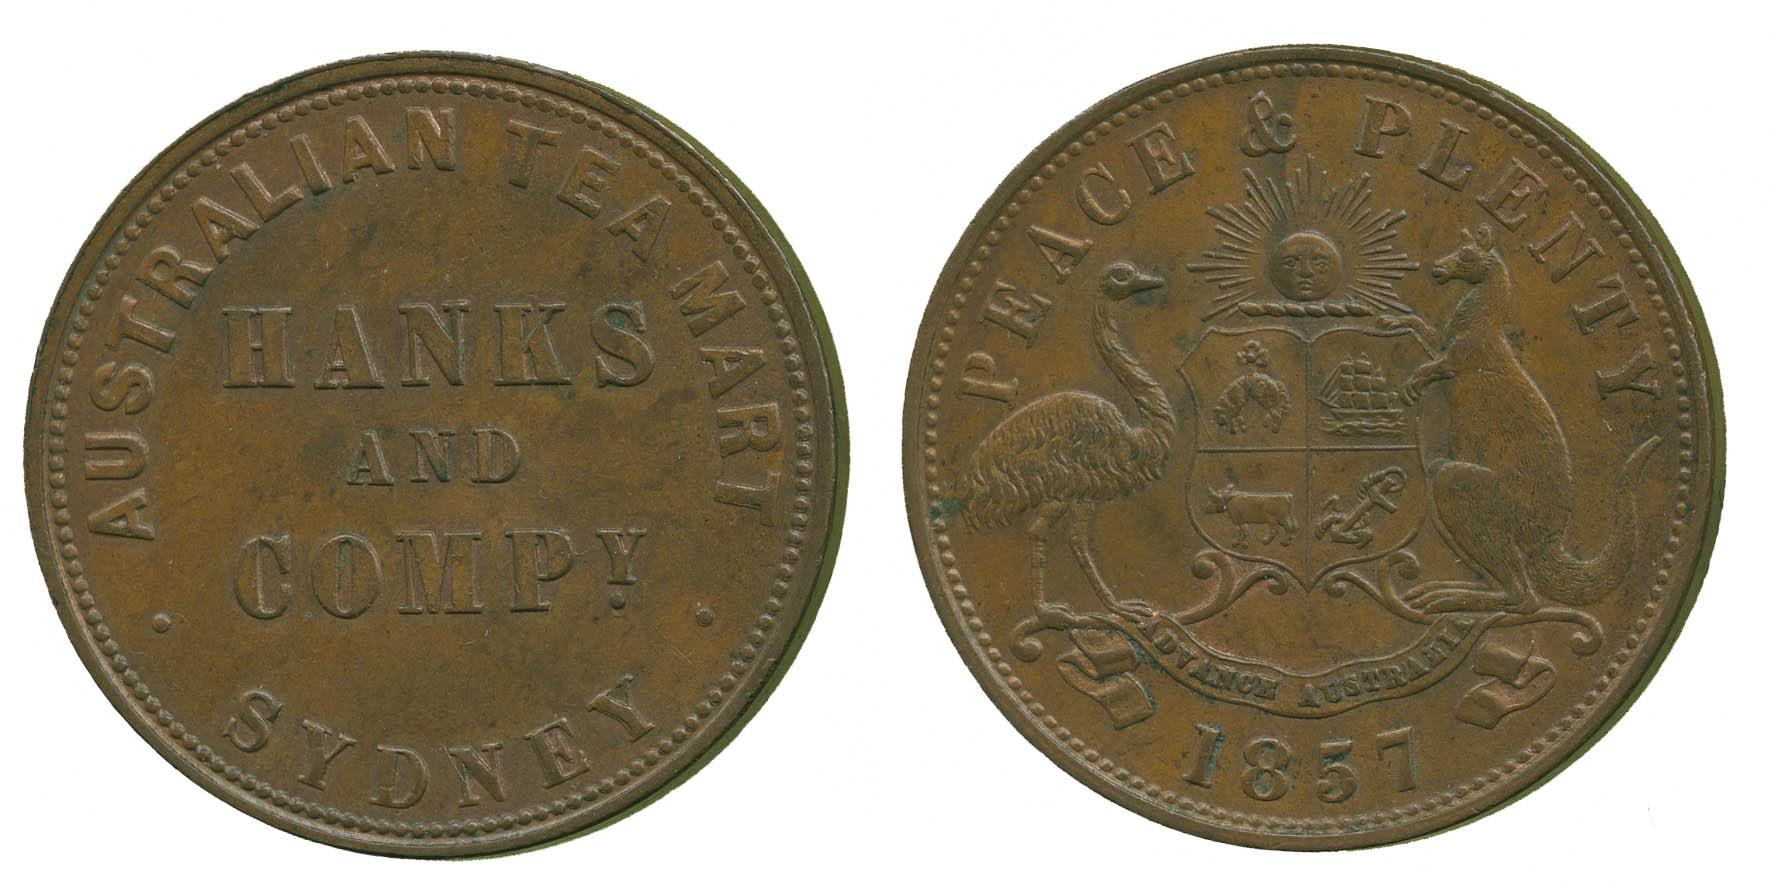 Australia, Sydney, Hanks & Company, Penny Token, 1857